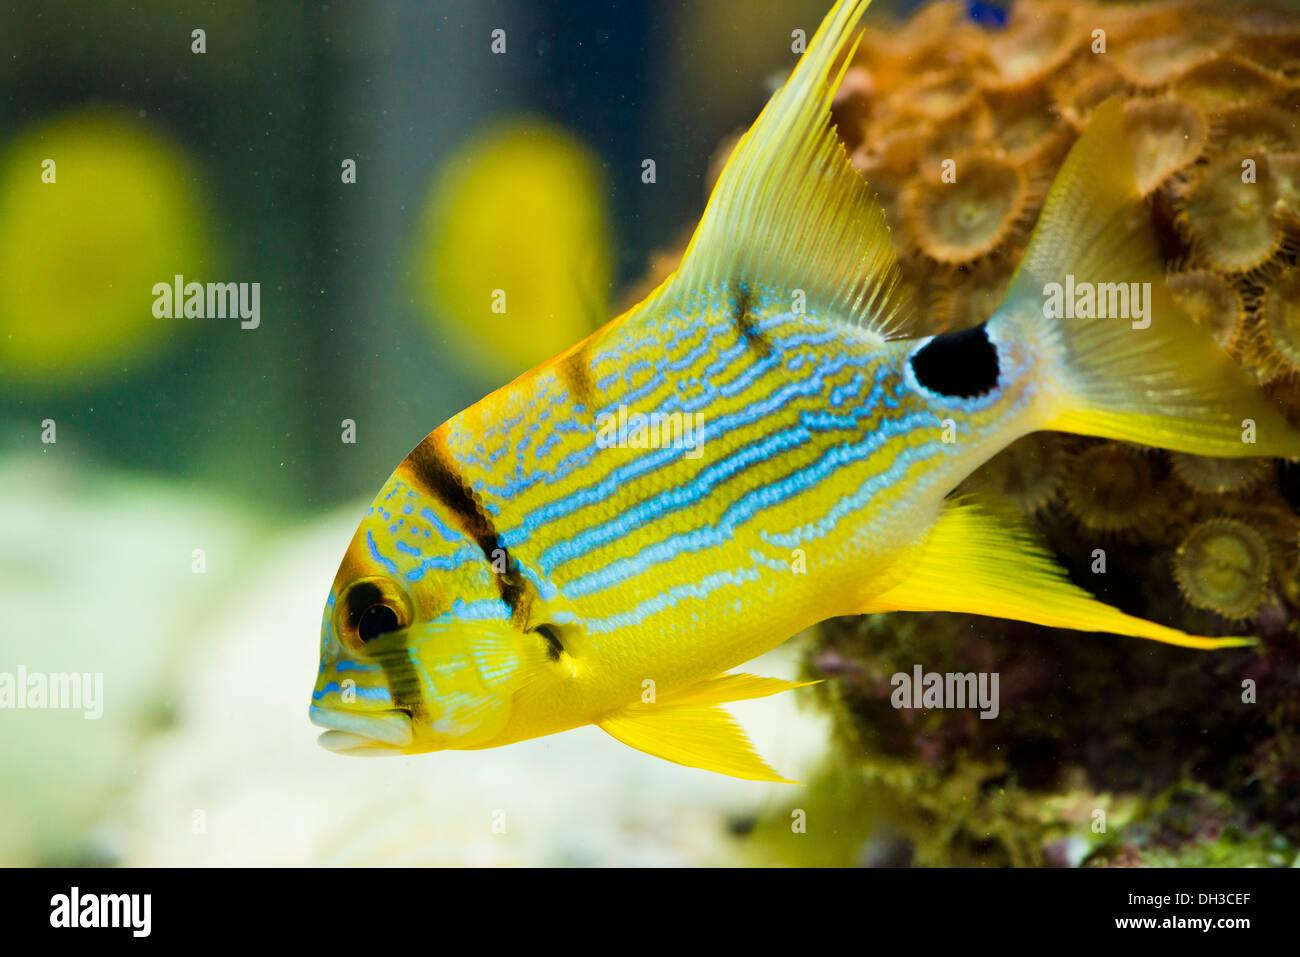 symphorichthus spilurus - yellow, sea fish. - Stock Image